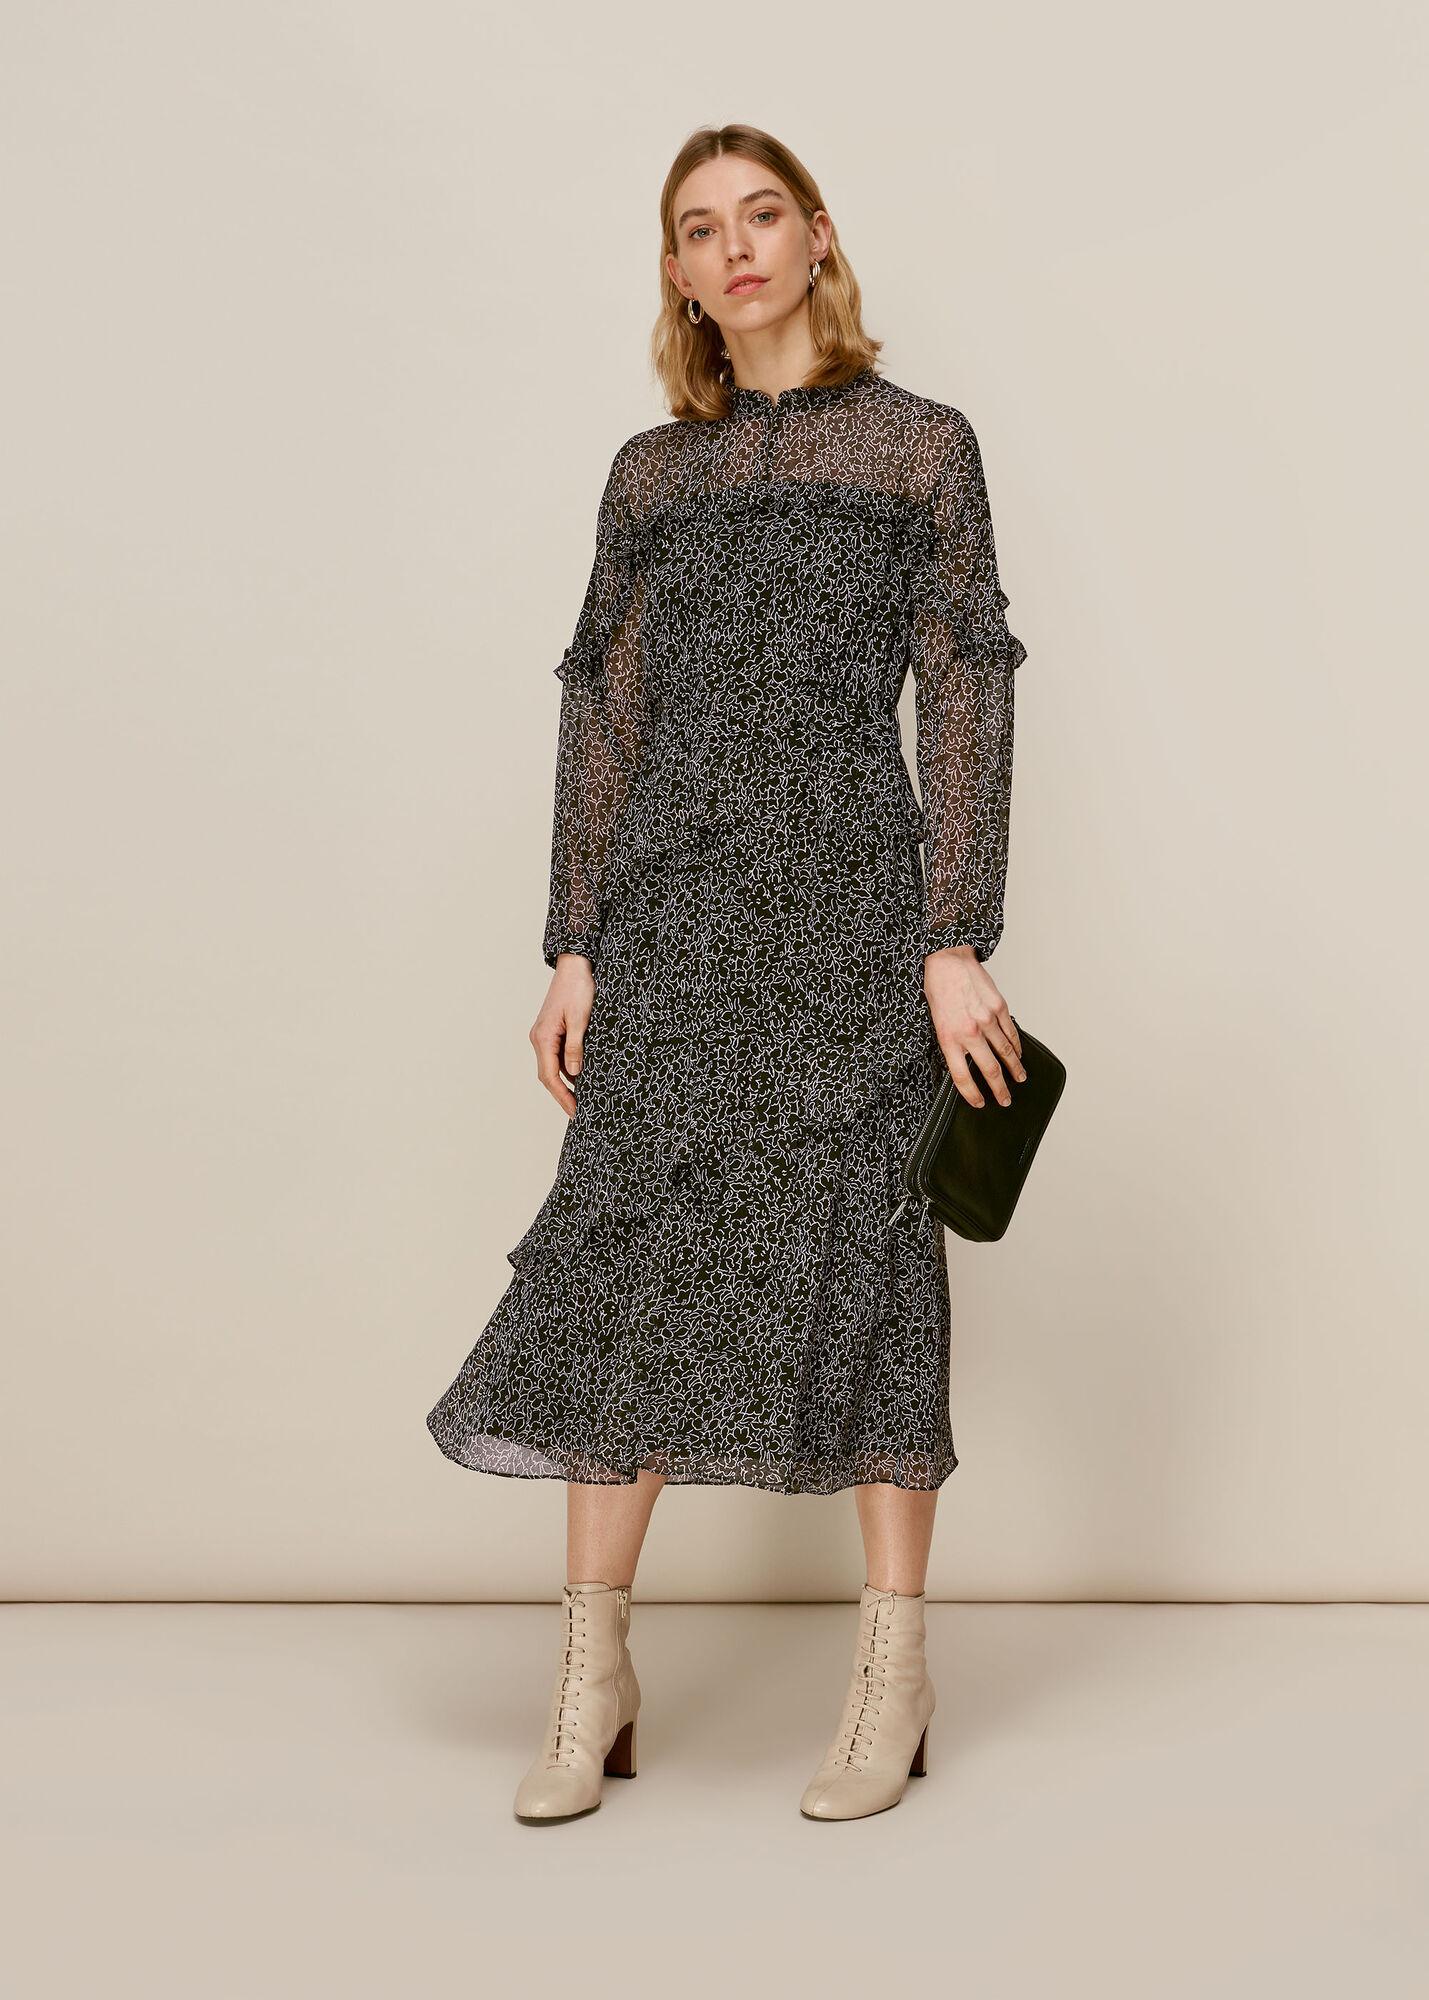 Macy Sketched Floral Dress